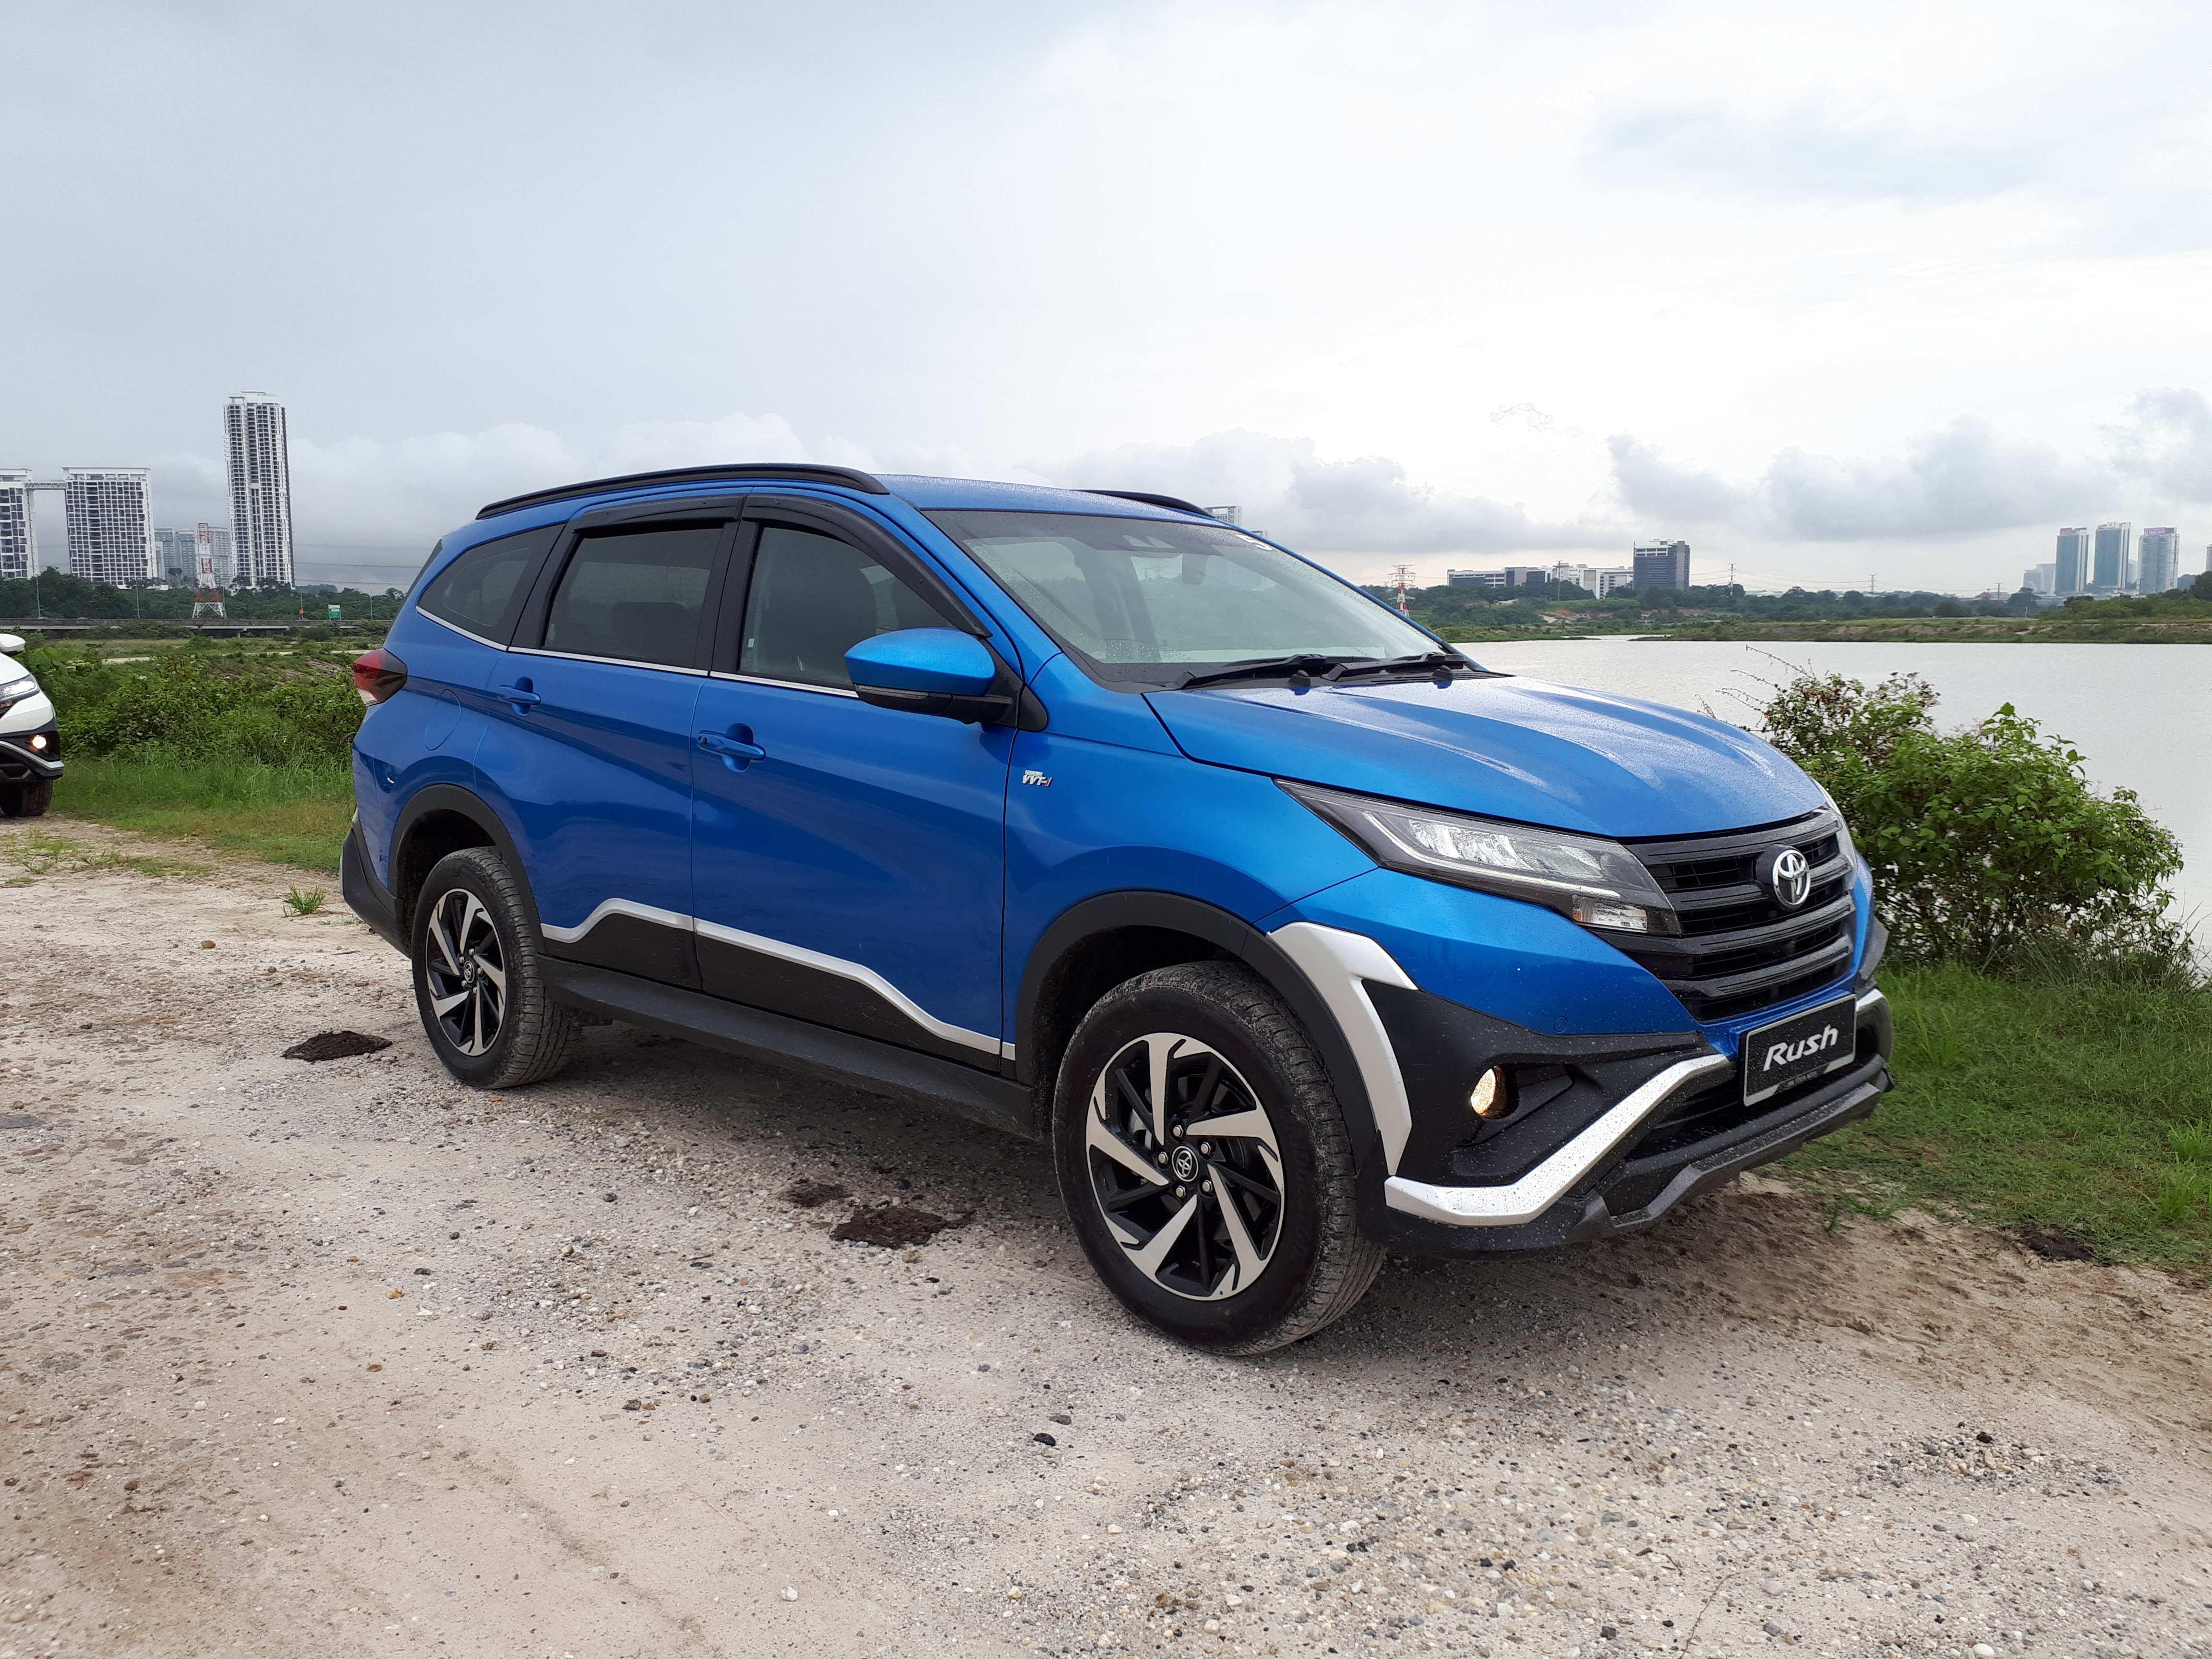 18 Best Review 2019 Toyota Rush Price with 2019 Toyota Rush